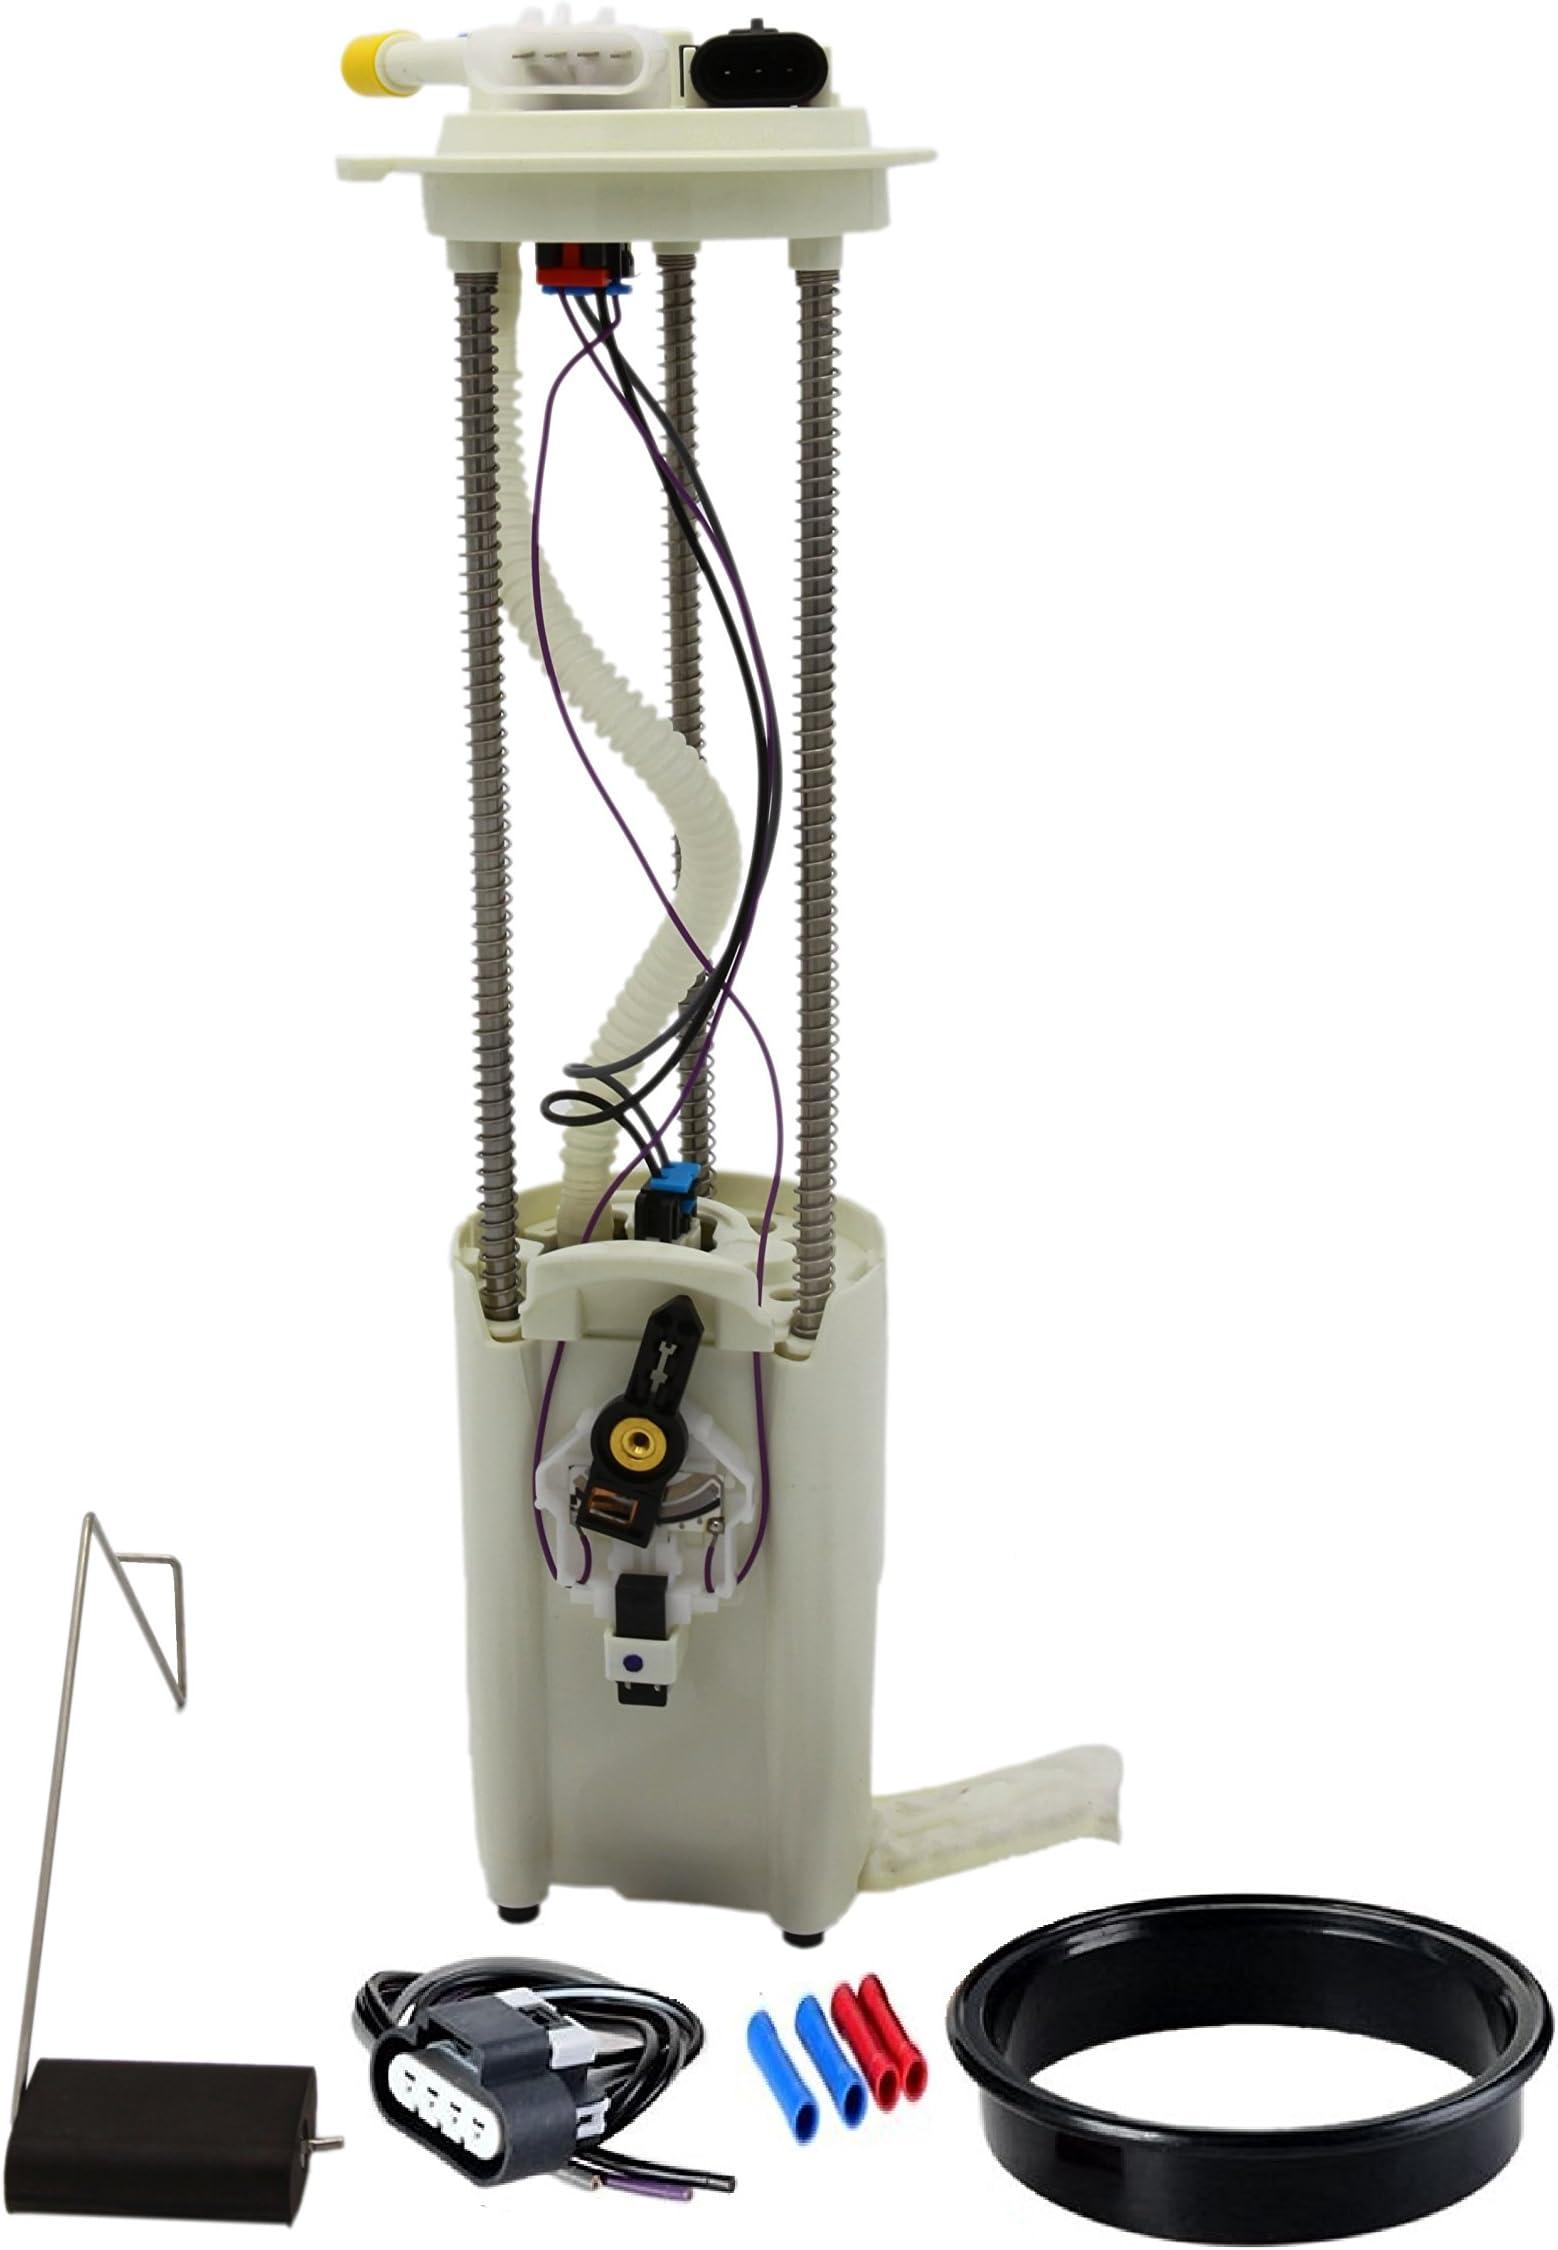 amazon com fuel pumps \u0026 accessories fuel system automotivefuel pump for pickup chevy chevrolet silverado gmc sierra 1999 2000 2001 2002 2003 2004 4 3